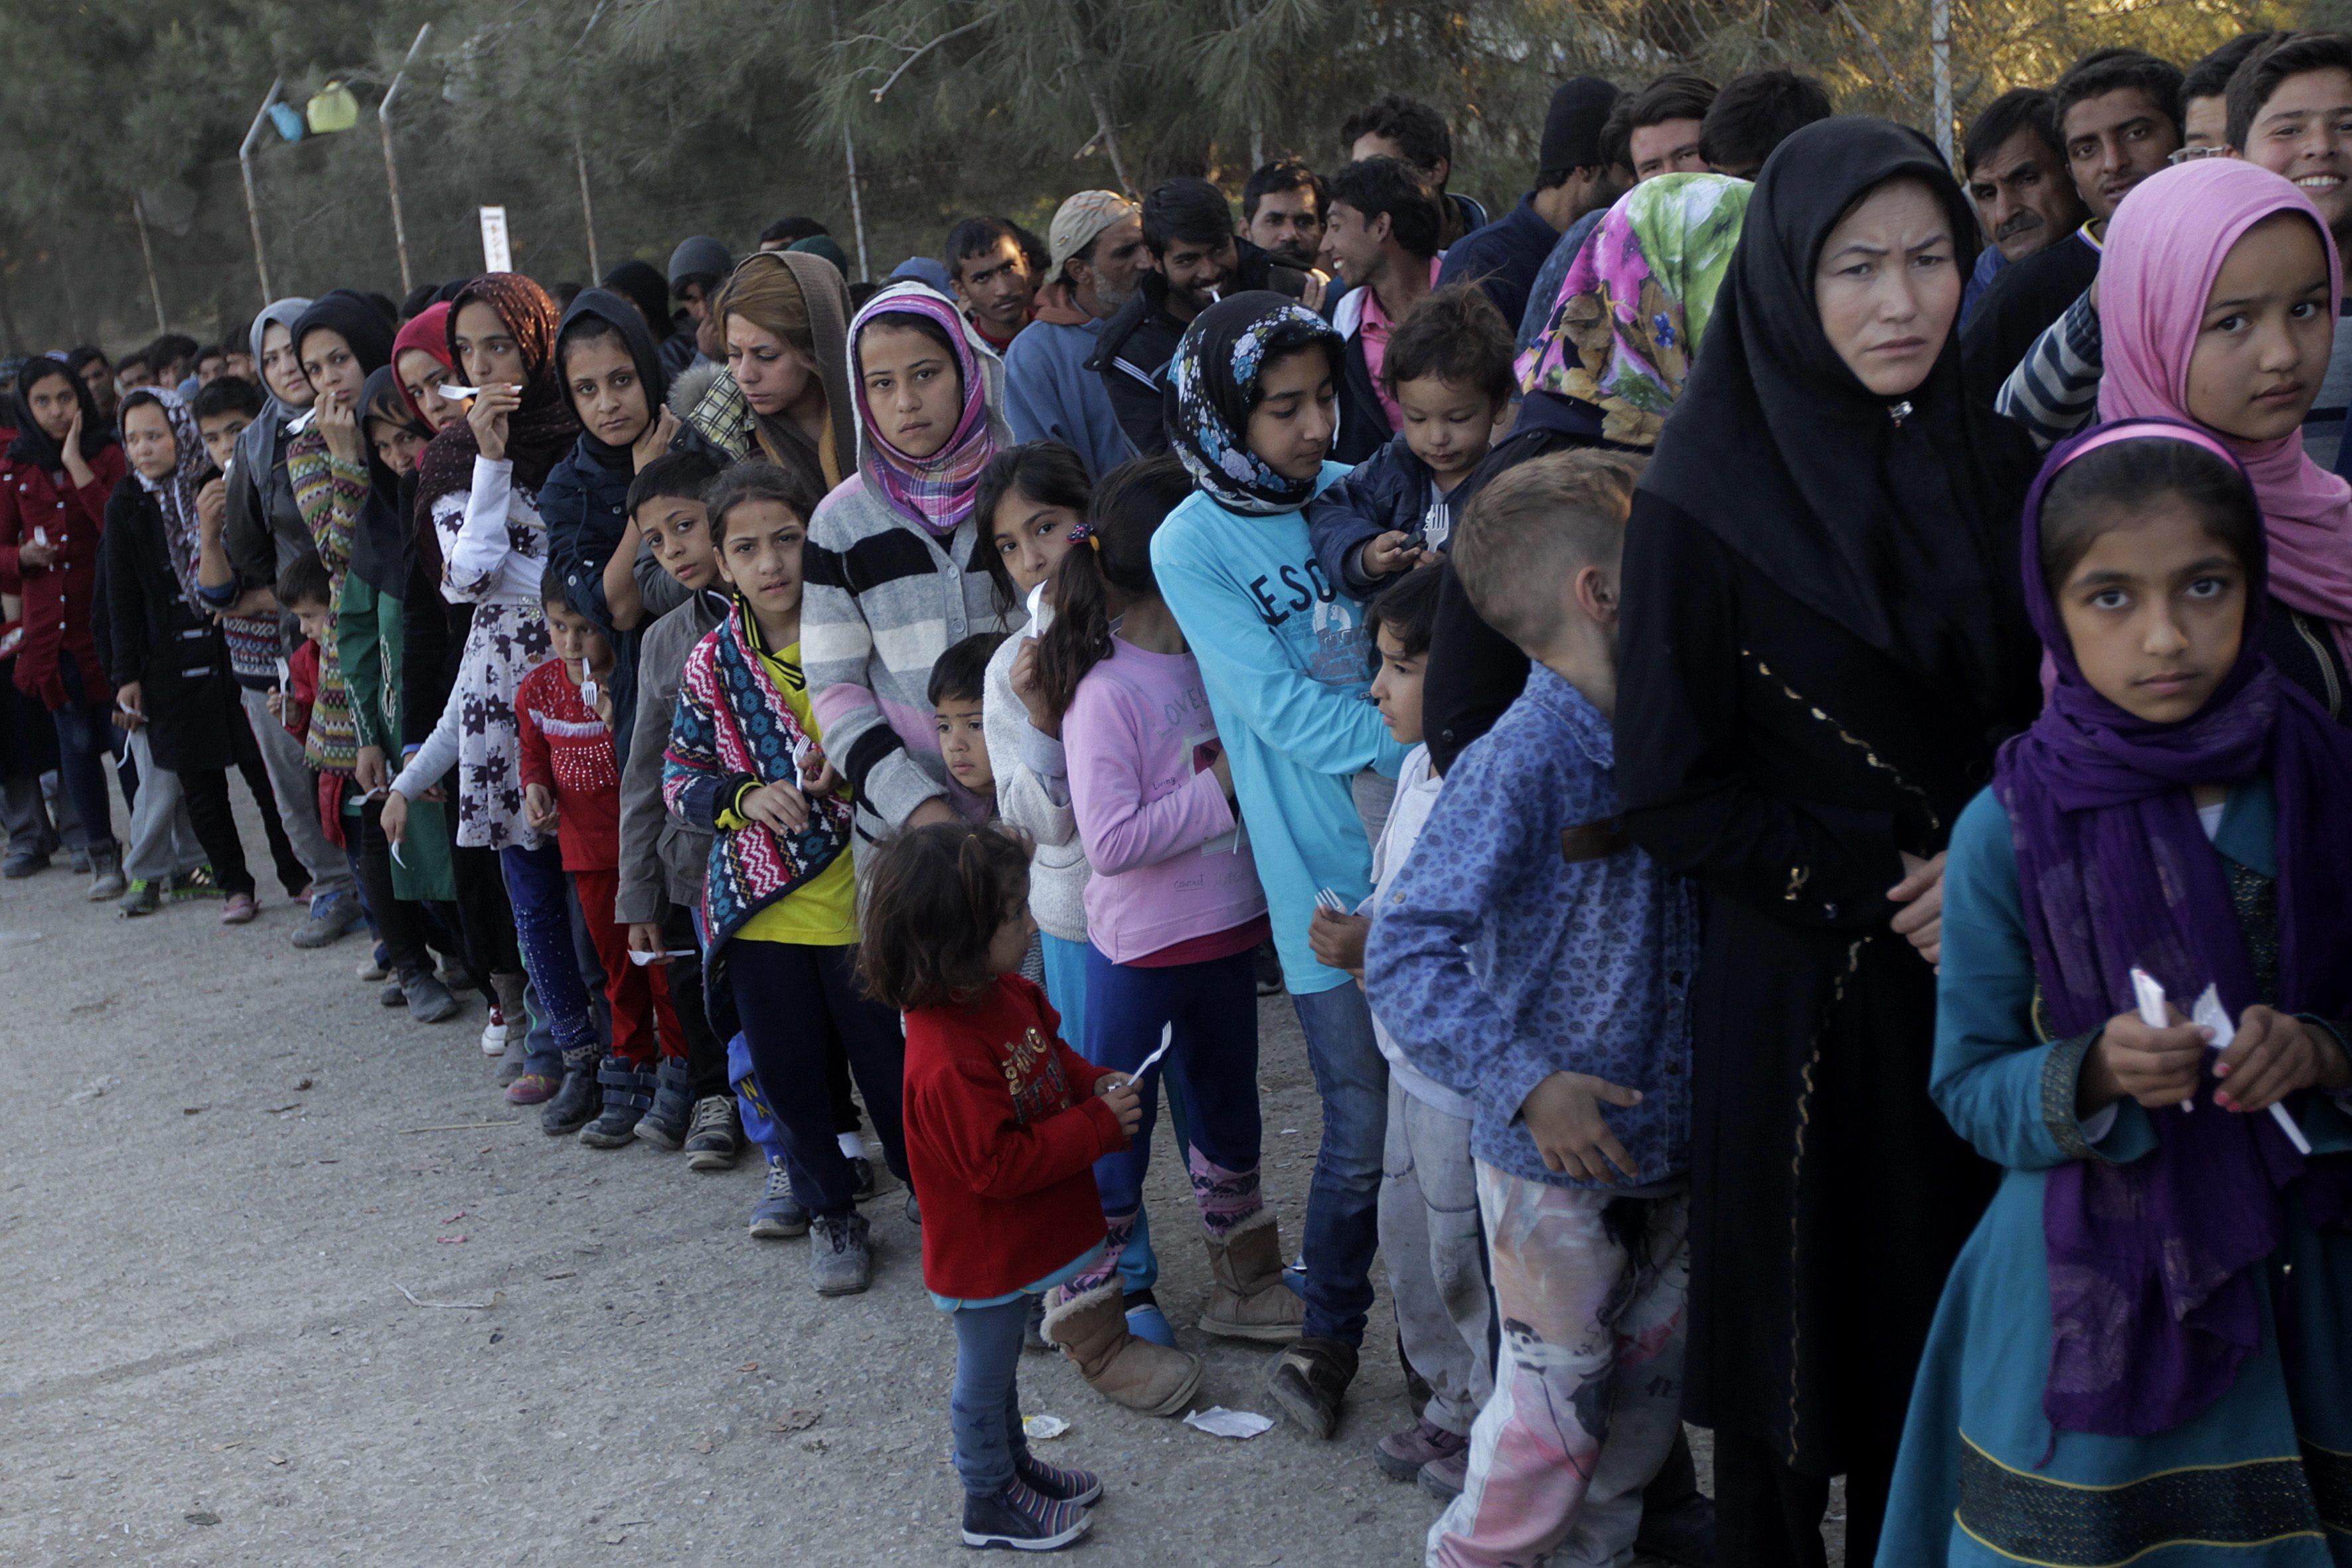 Banca Centrala a Germaniei avertizeaza: O mare parte dintre migrantii ajunsi in Germania risca sa ramana someri